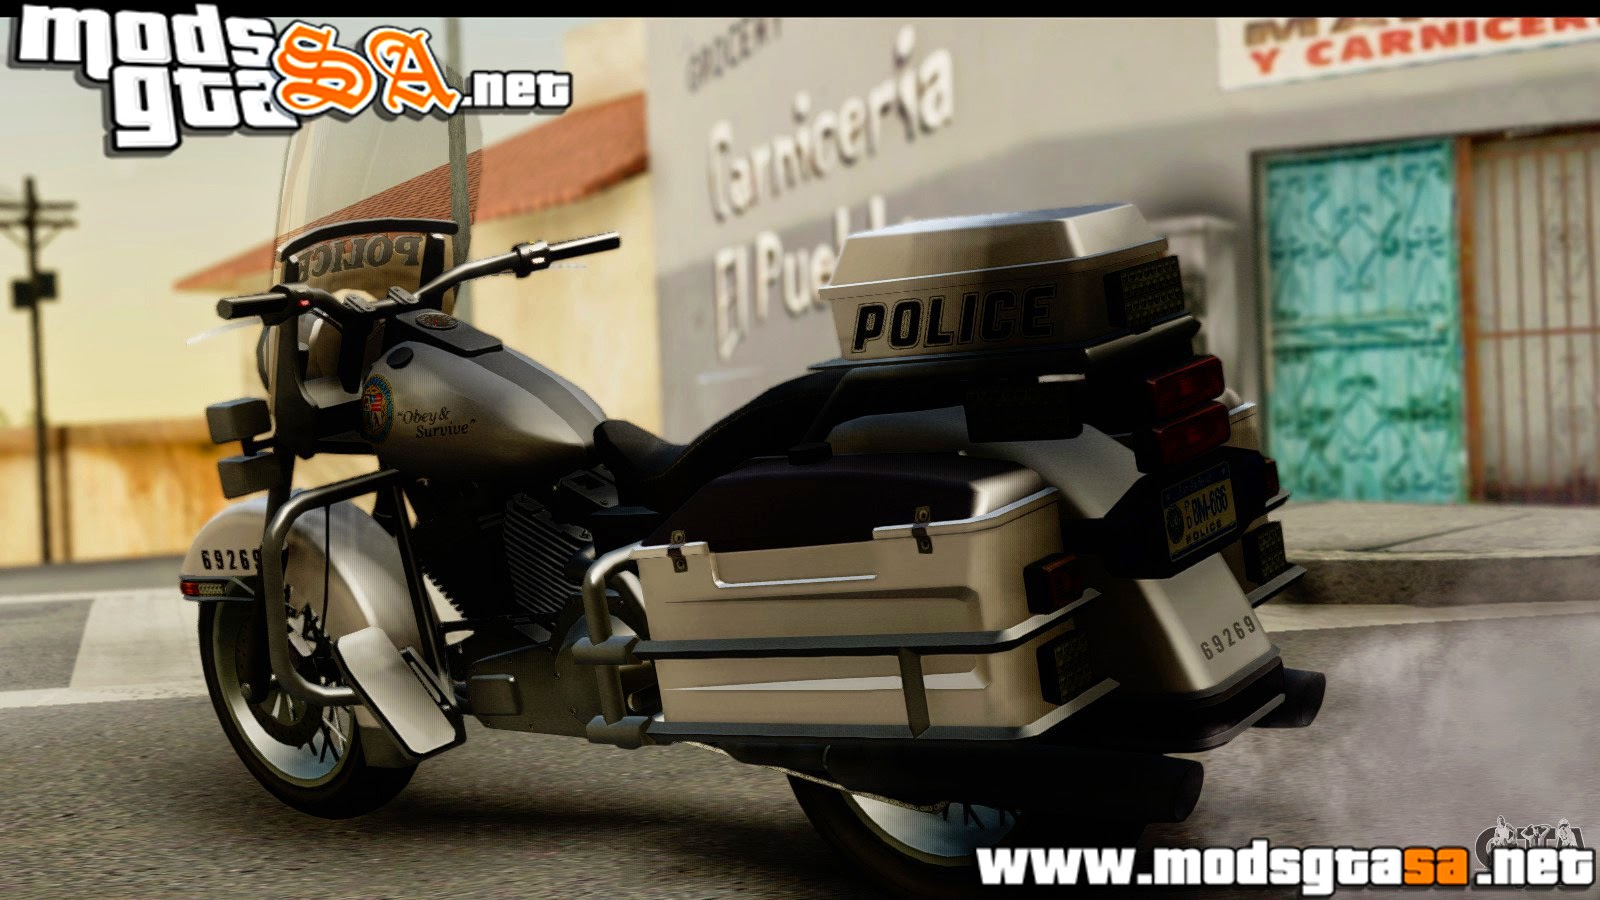 SA - Moto da Policia do GTA V